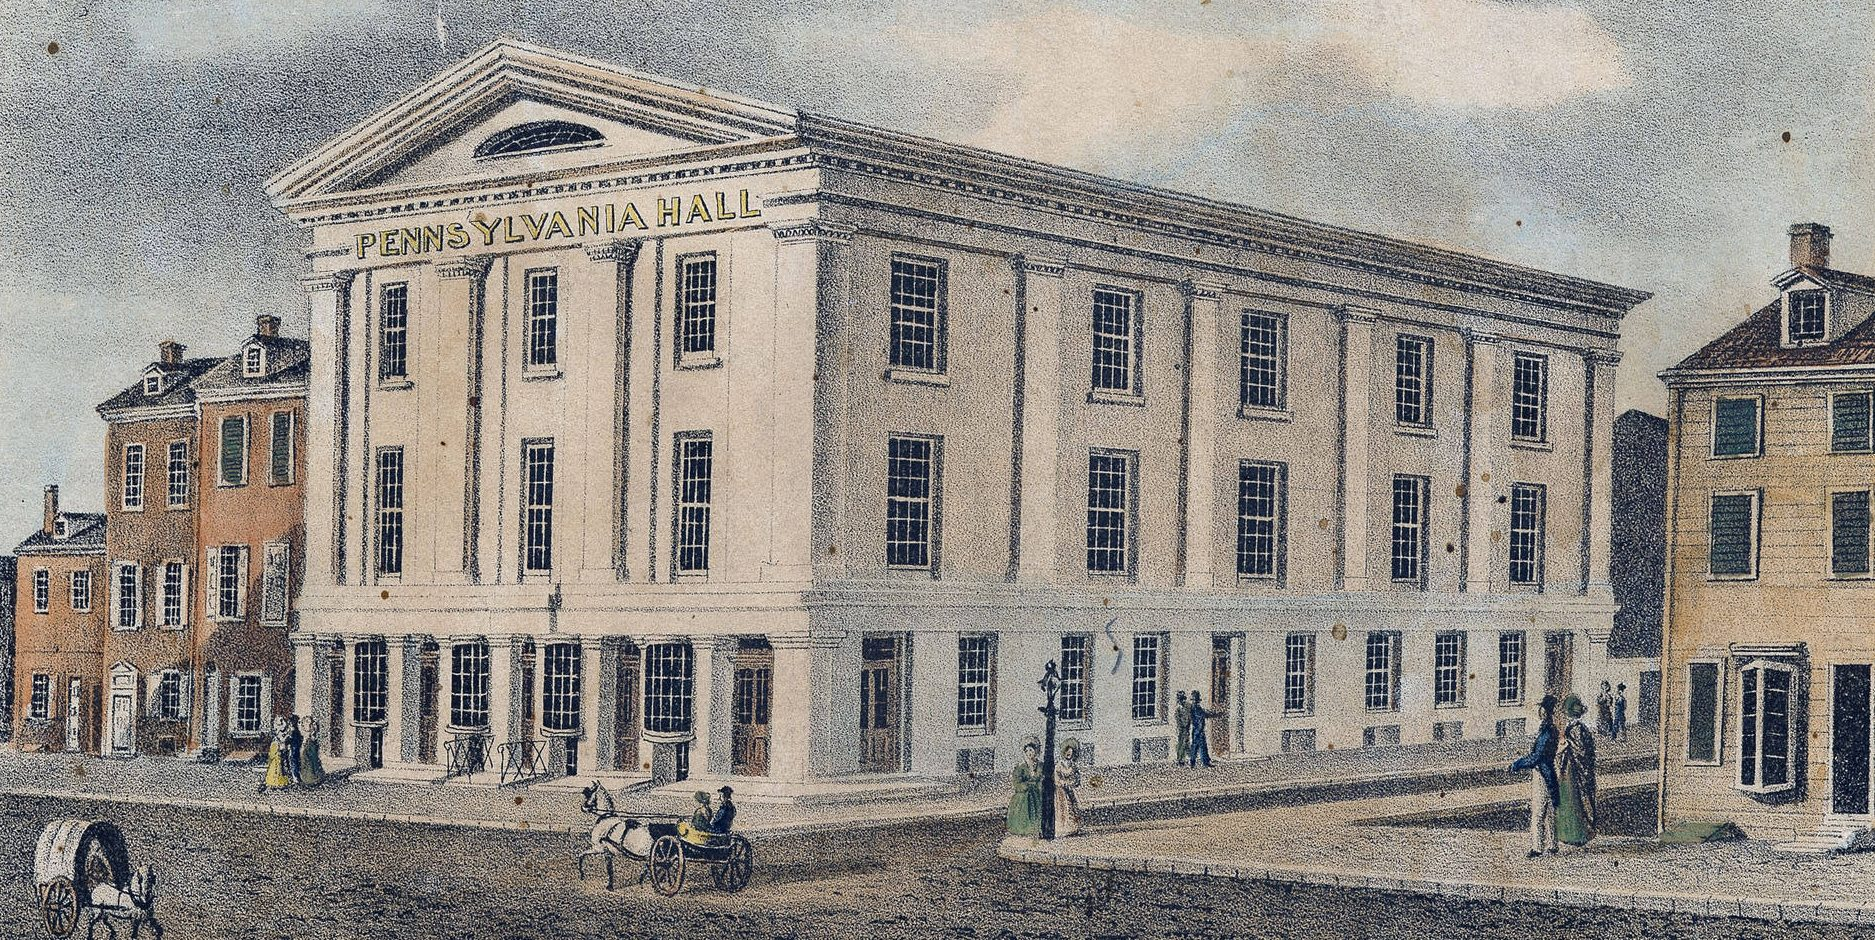 Pennsylvania Hall